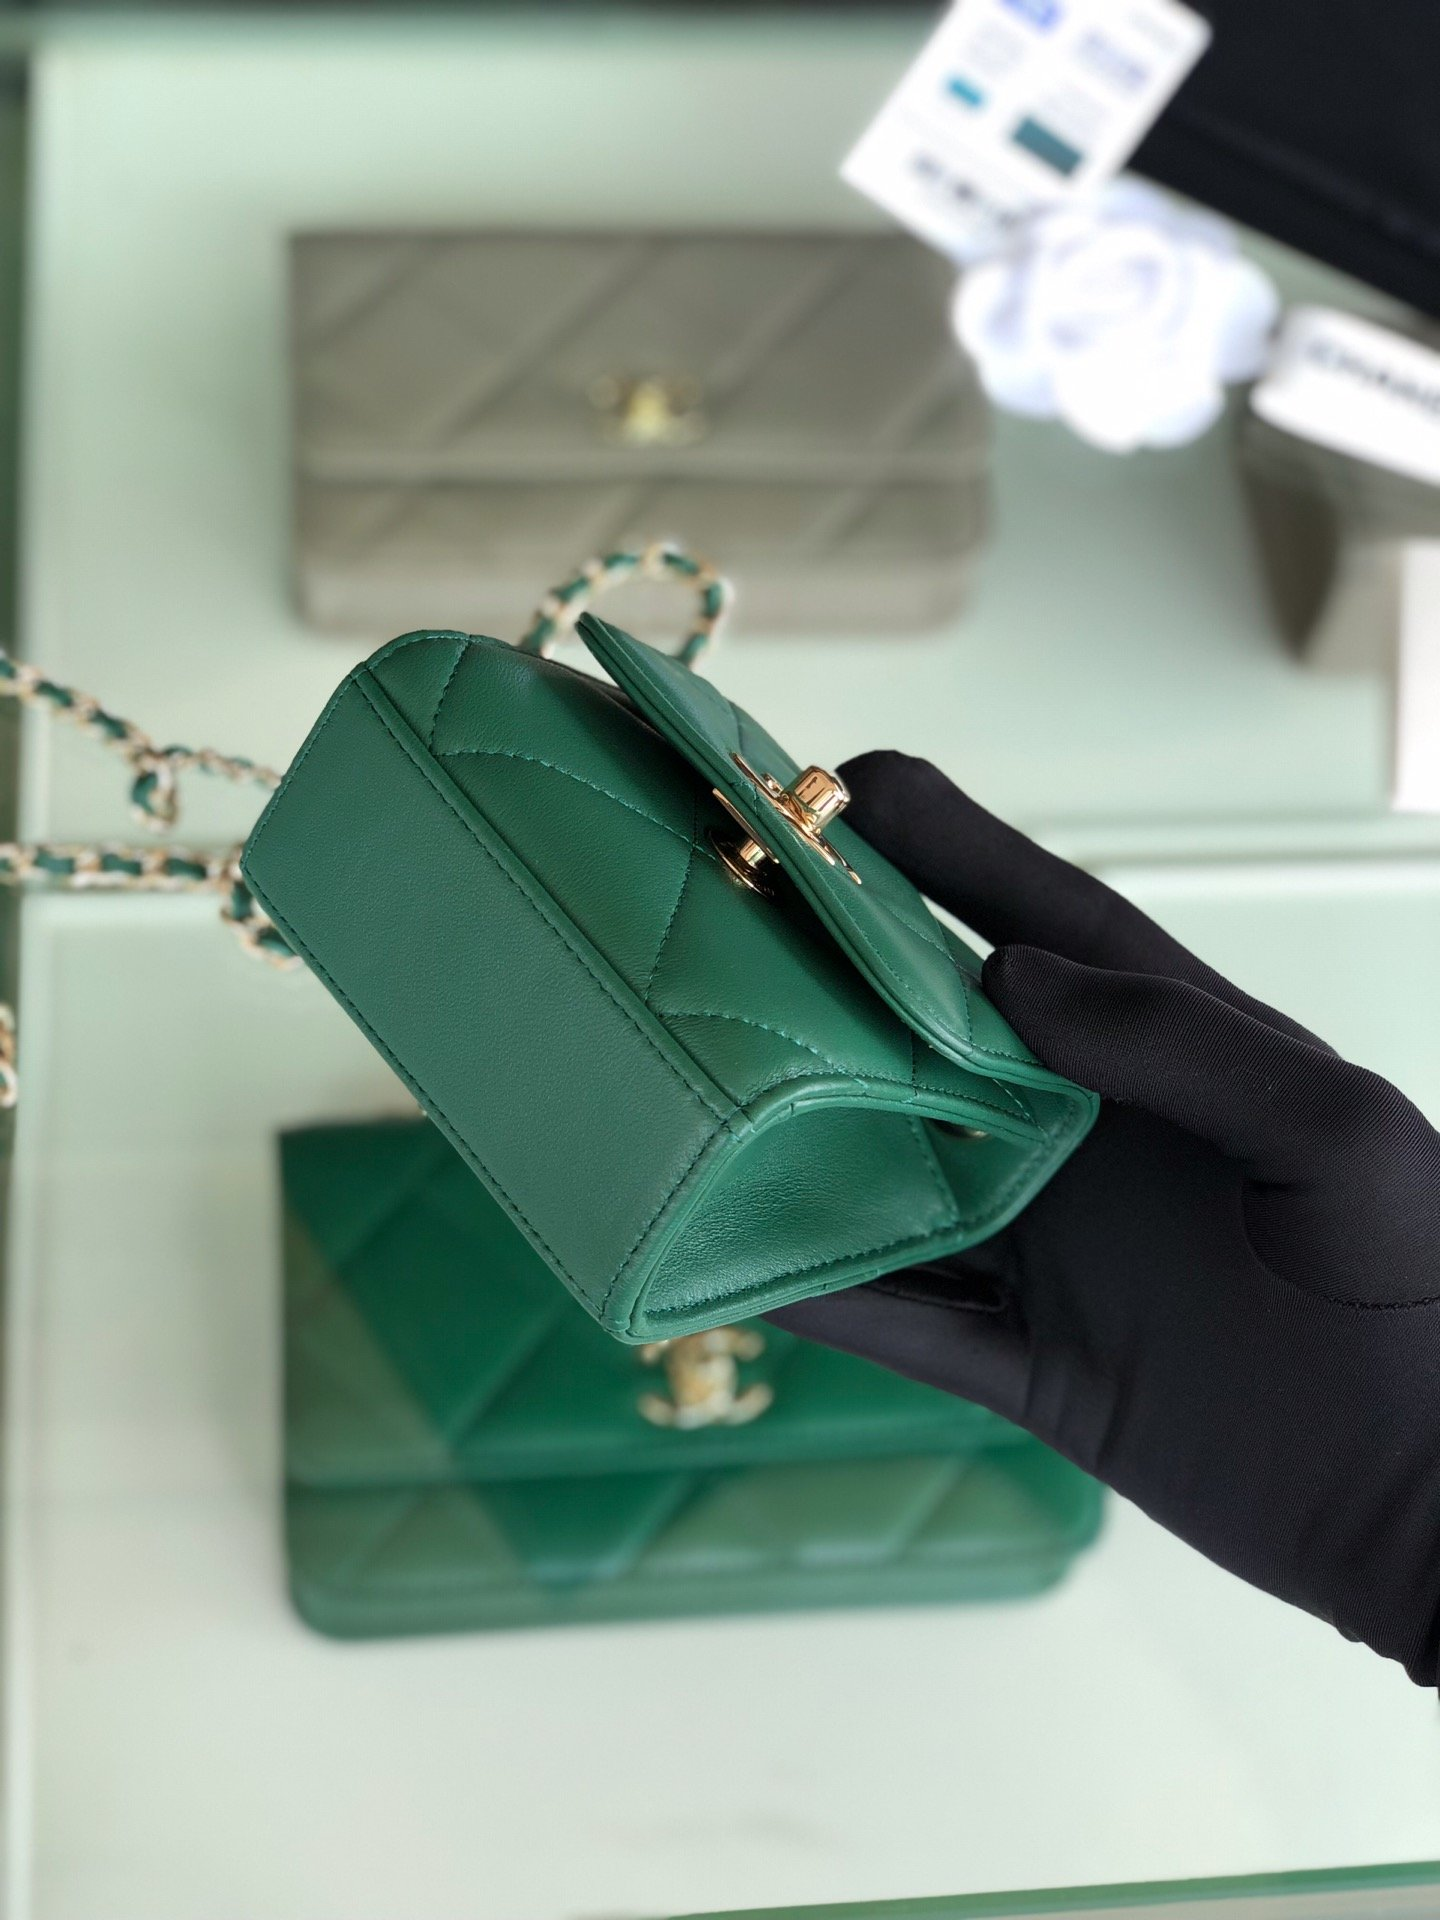 Chanel香奈儿专柜同款 大方格新款零钱包 单肩斜挎(图4)